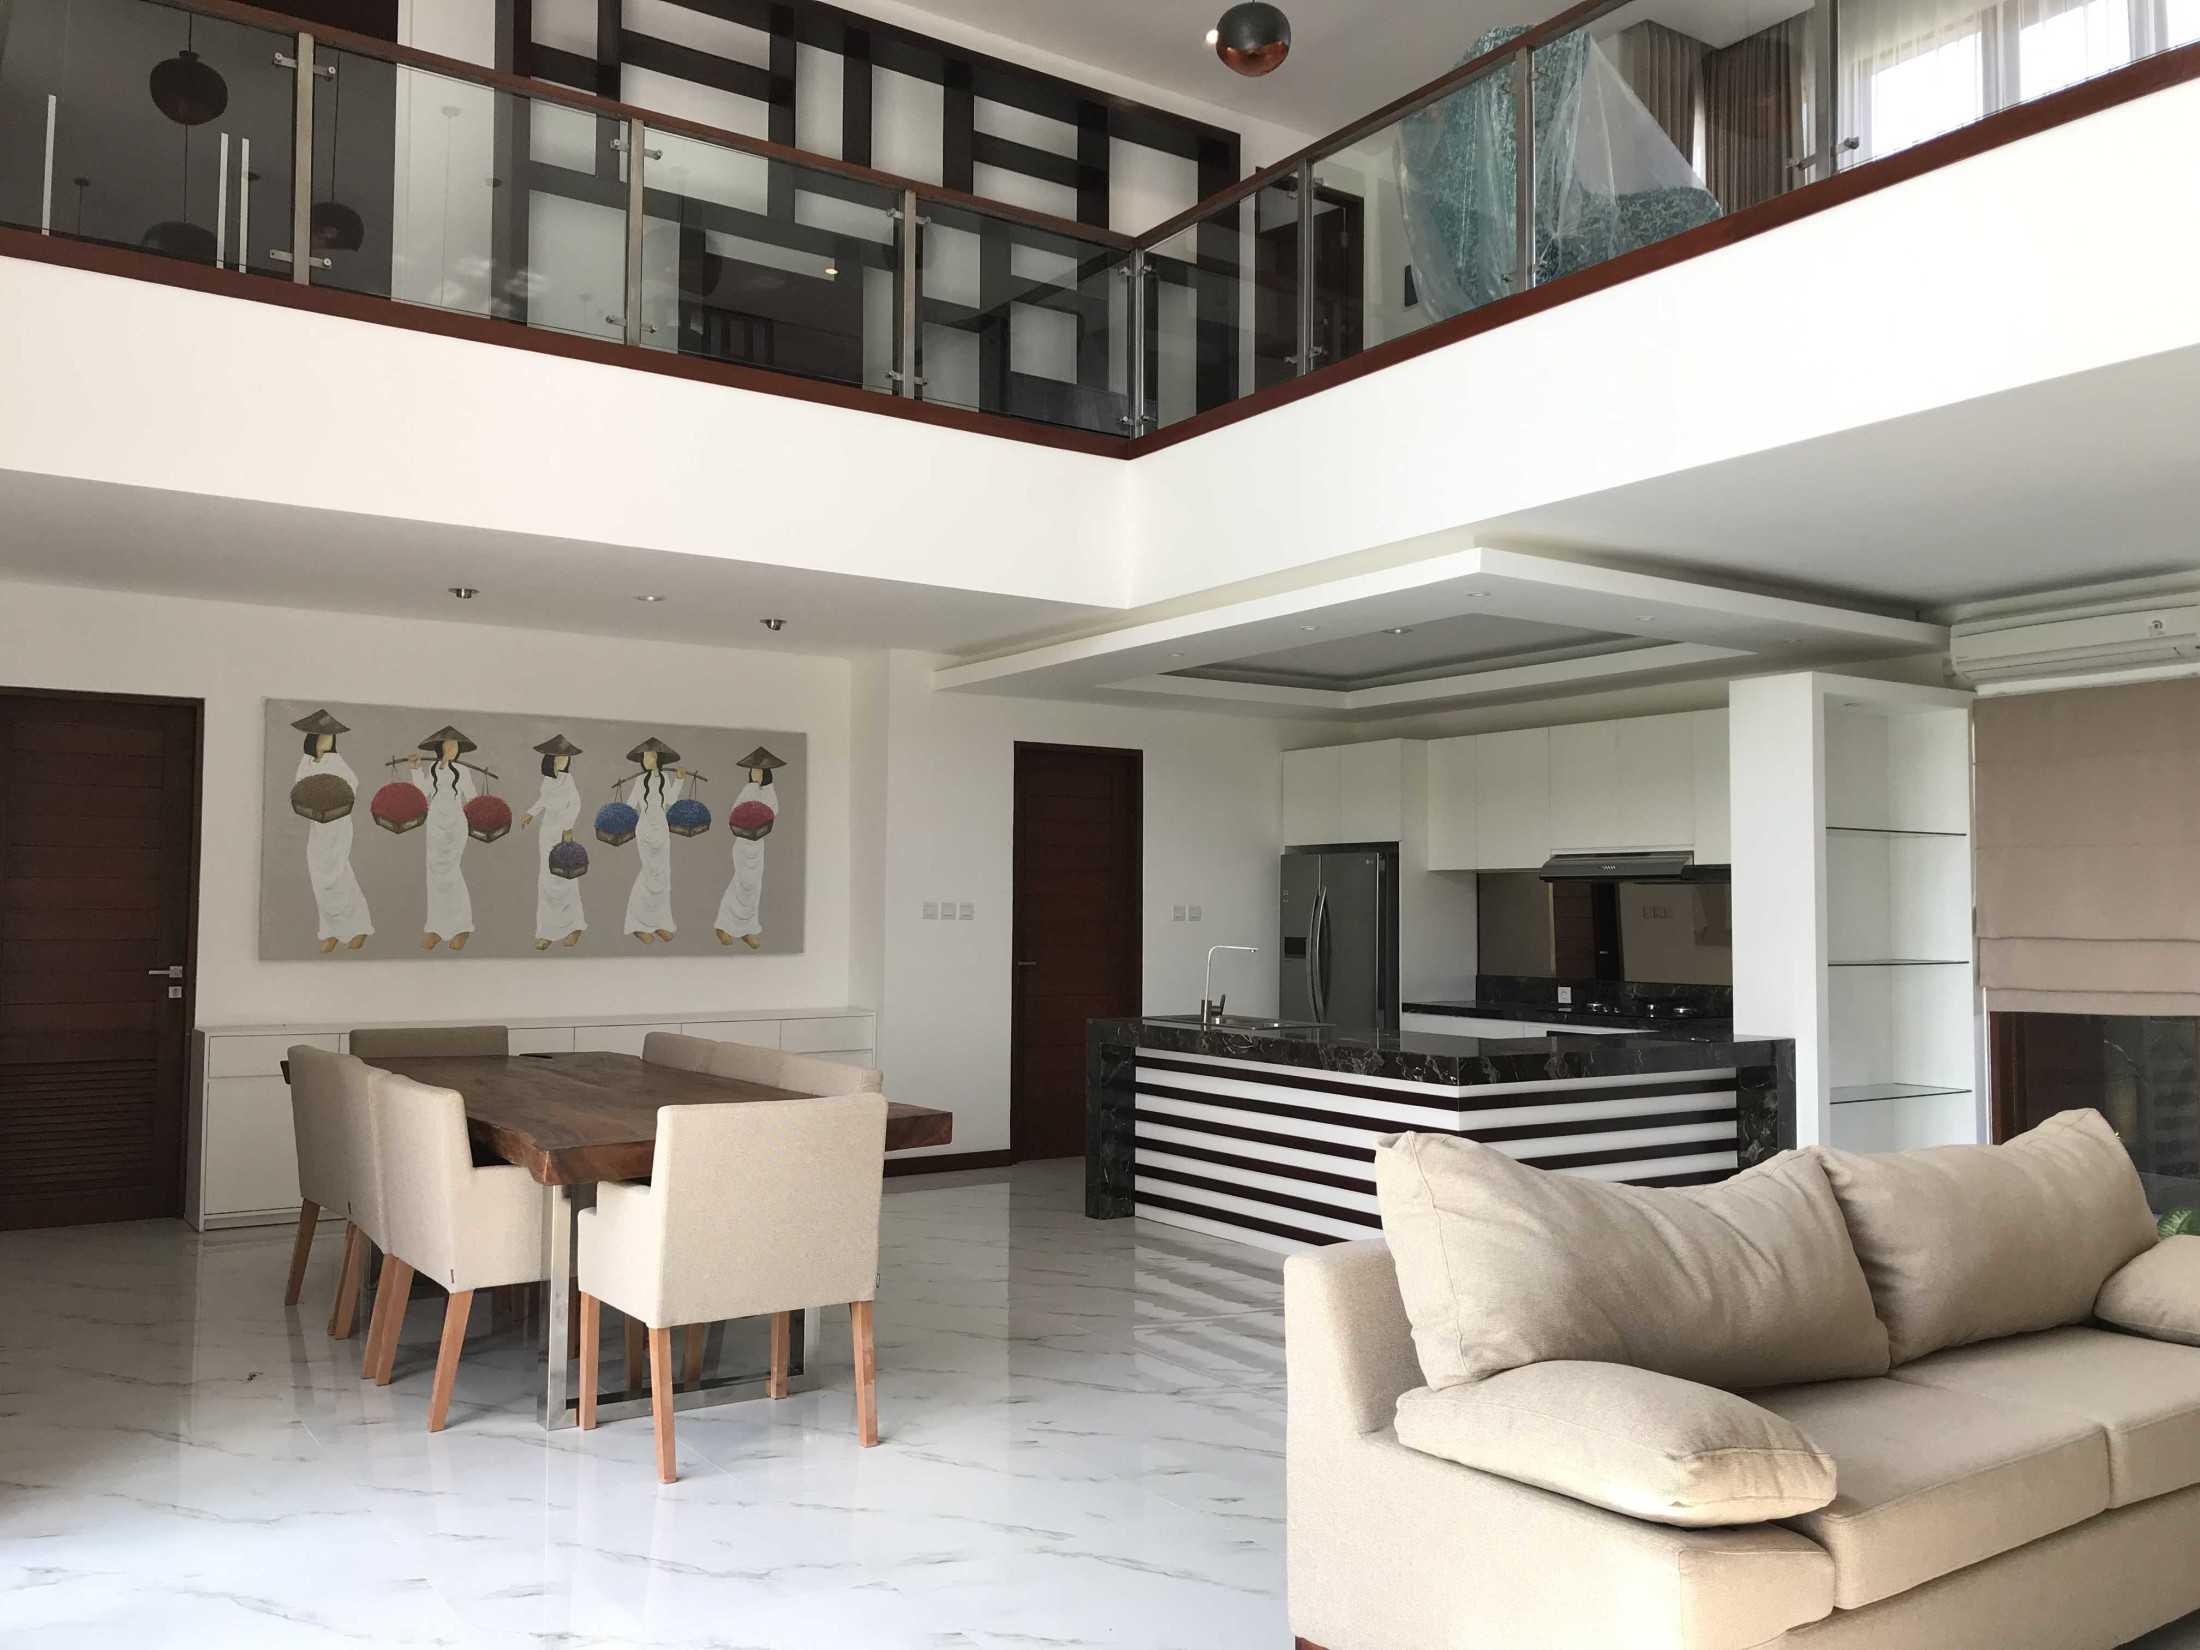 Sequal Design A Six Villa Canggu, Kec. Kuta Utara, Kabupaten Badung, Bali, Indonesia Canggu, Kec. Kuta Utara, Kabupaten Badung, Bali, Indonesia Sequal-Design-A-Six-Villa  112213